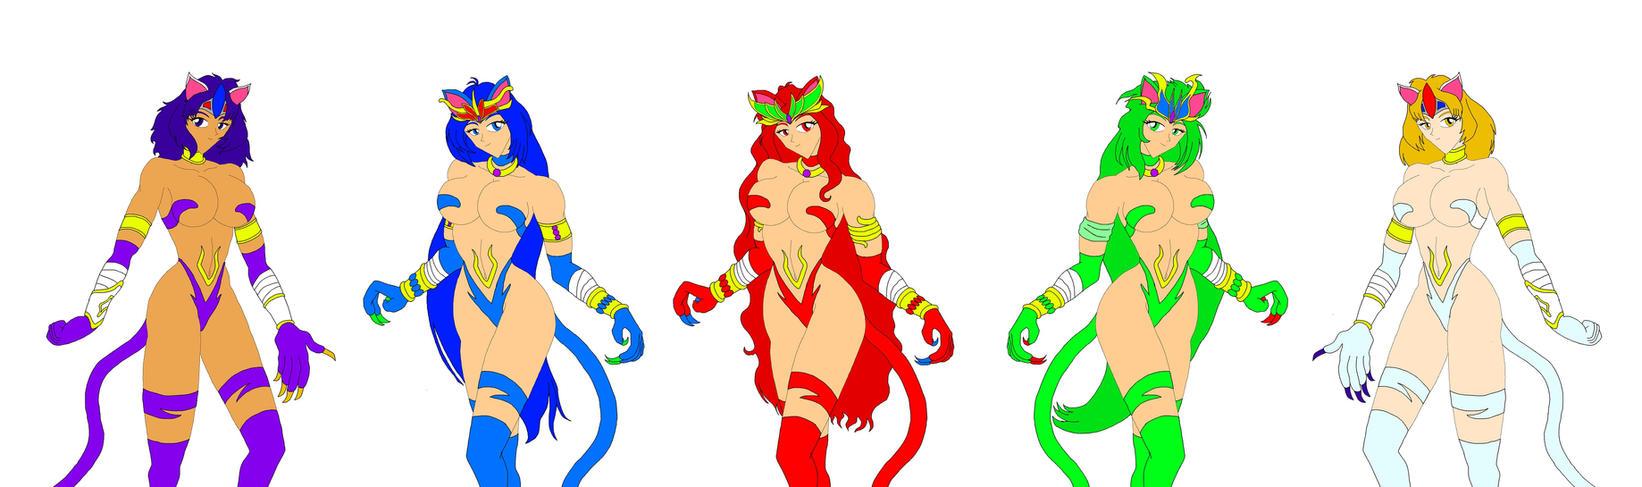 Capcom Cats: Elemental Shamans by NekoHybrid